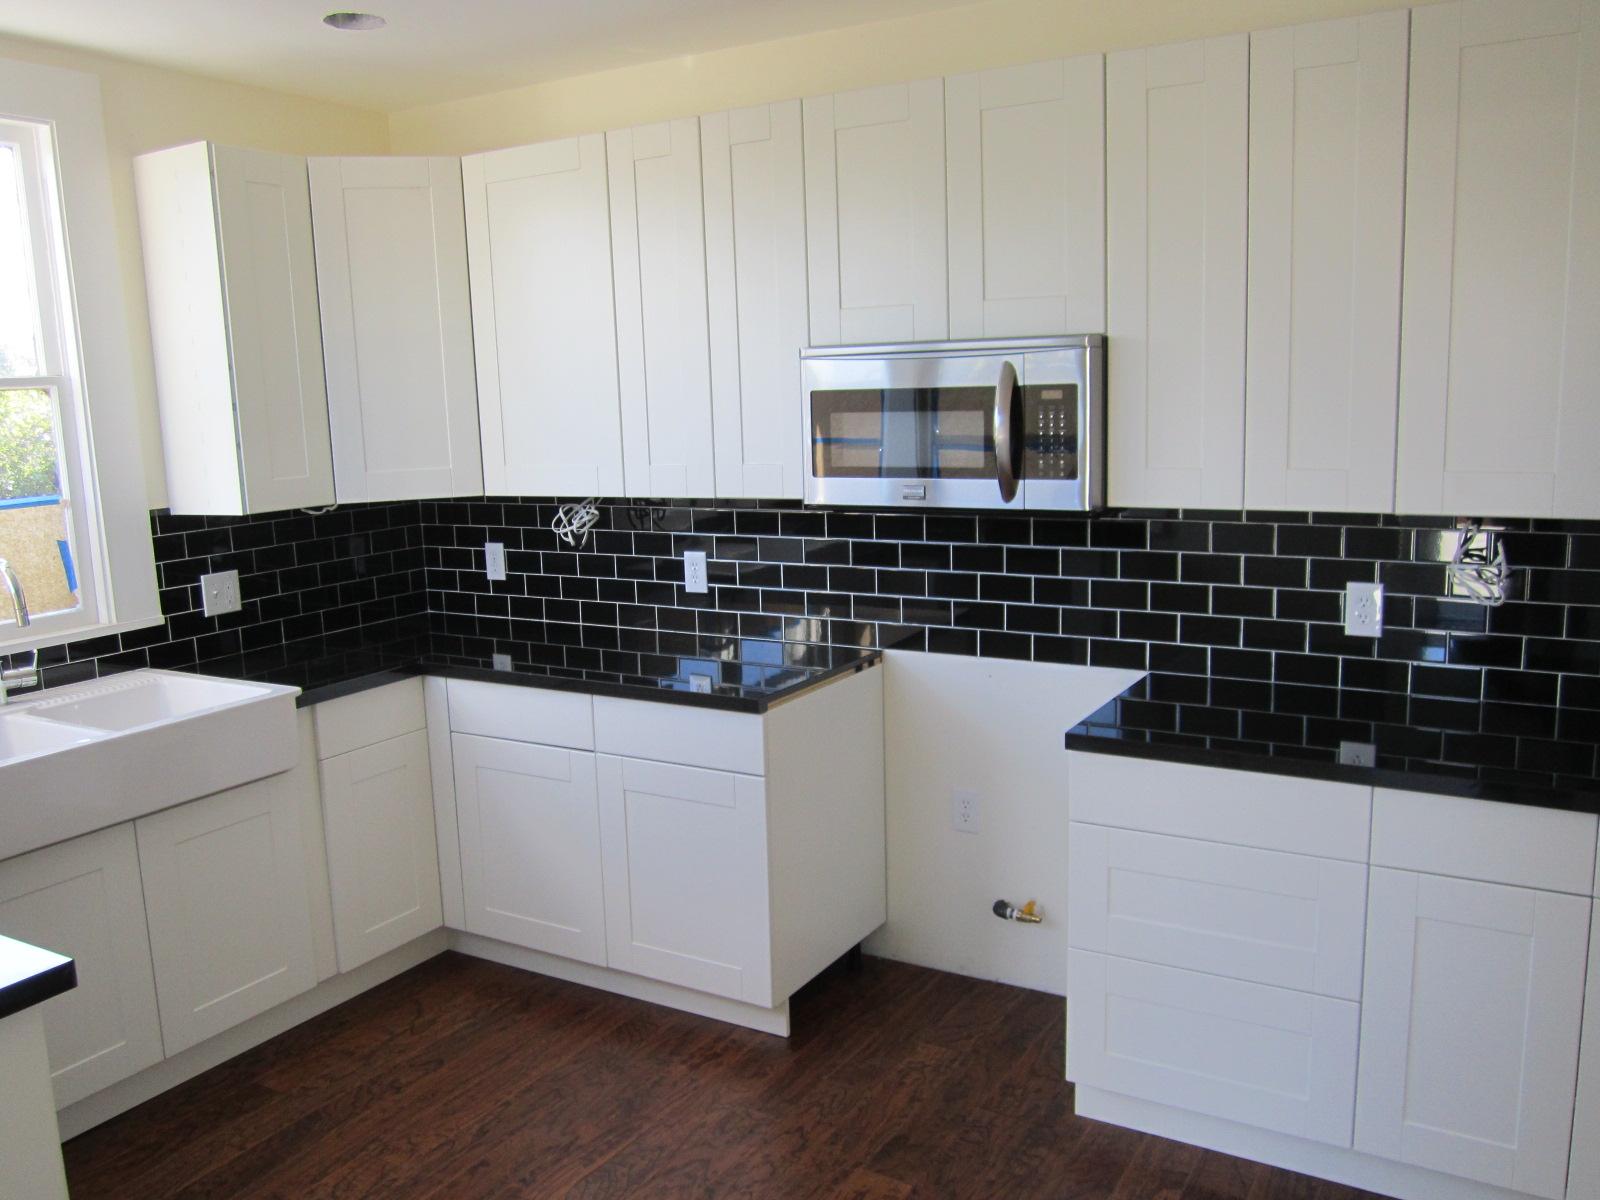 elegant black kitchen countertops black subway tiles for kitchen wall modern kitchen appliance huge top white